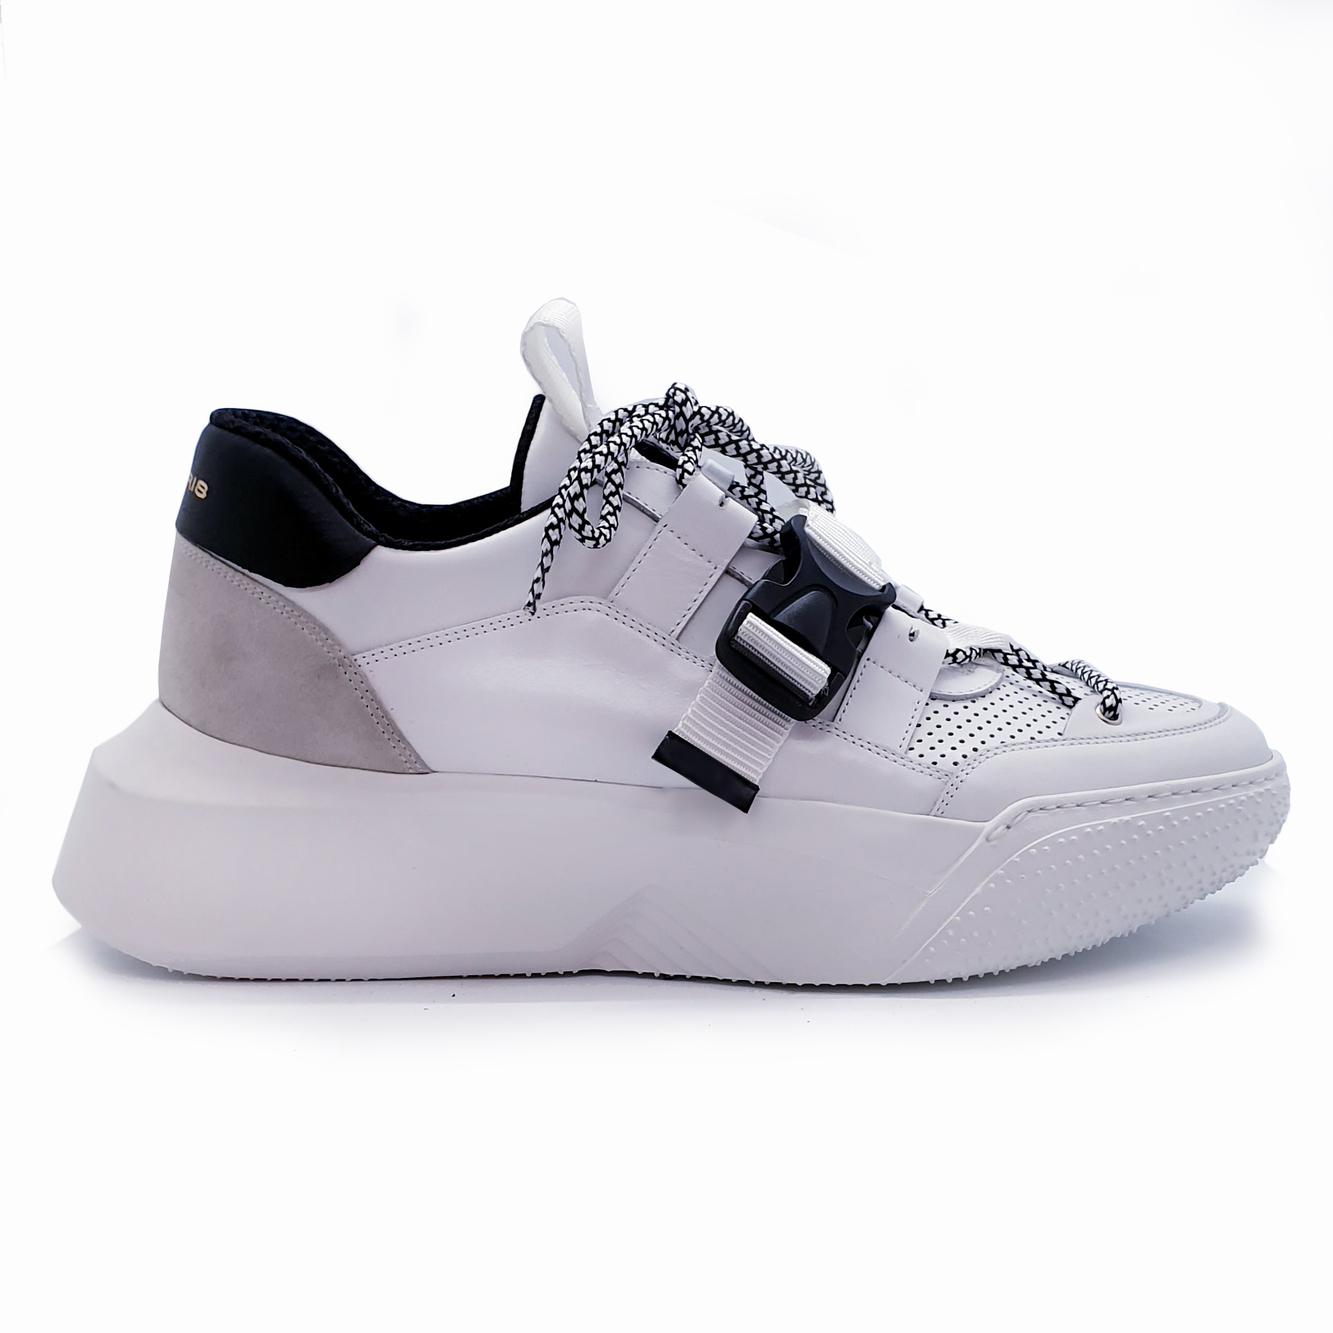 X13 WHITE